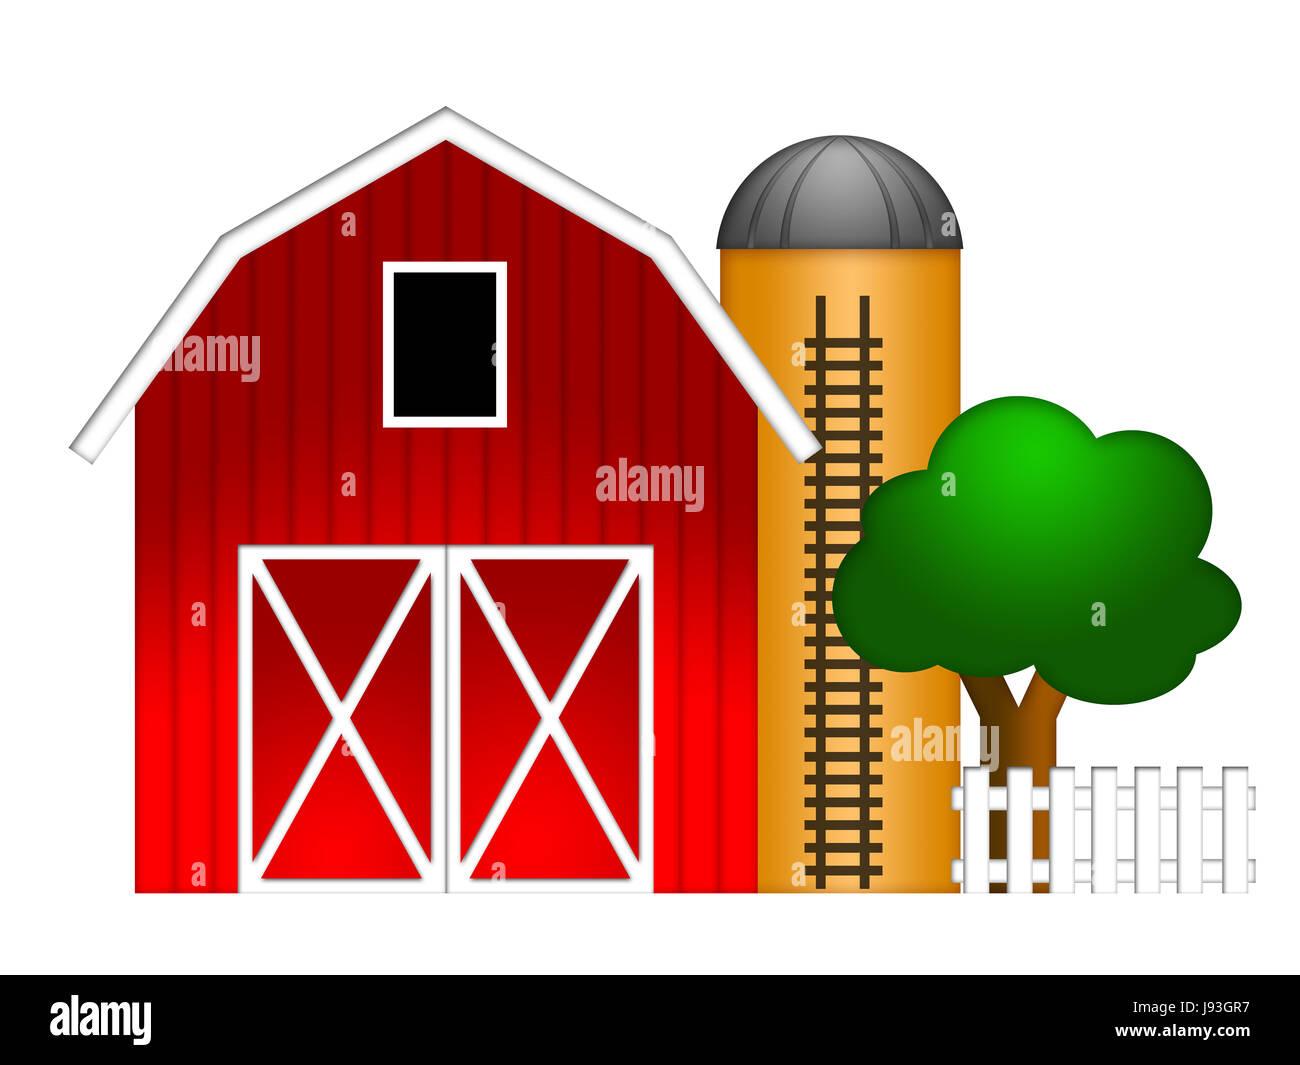 Elevator Lift Grain Barn Farm Hay Silo Ladder Red Cereal Tower